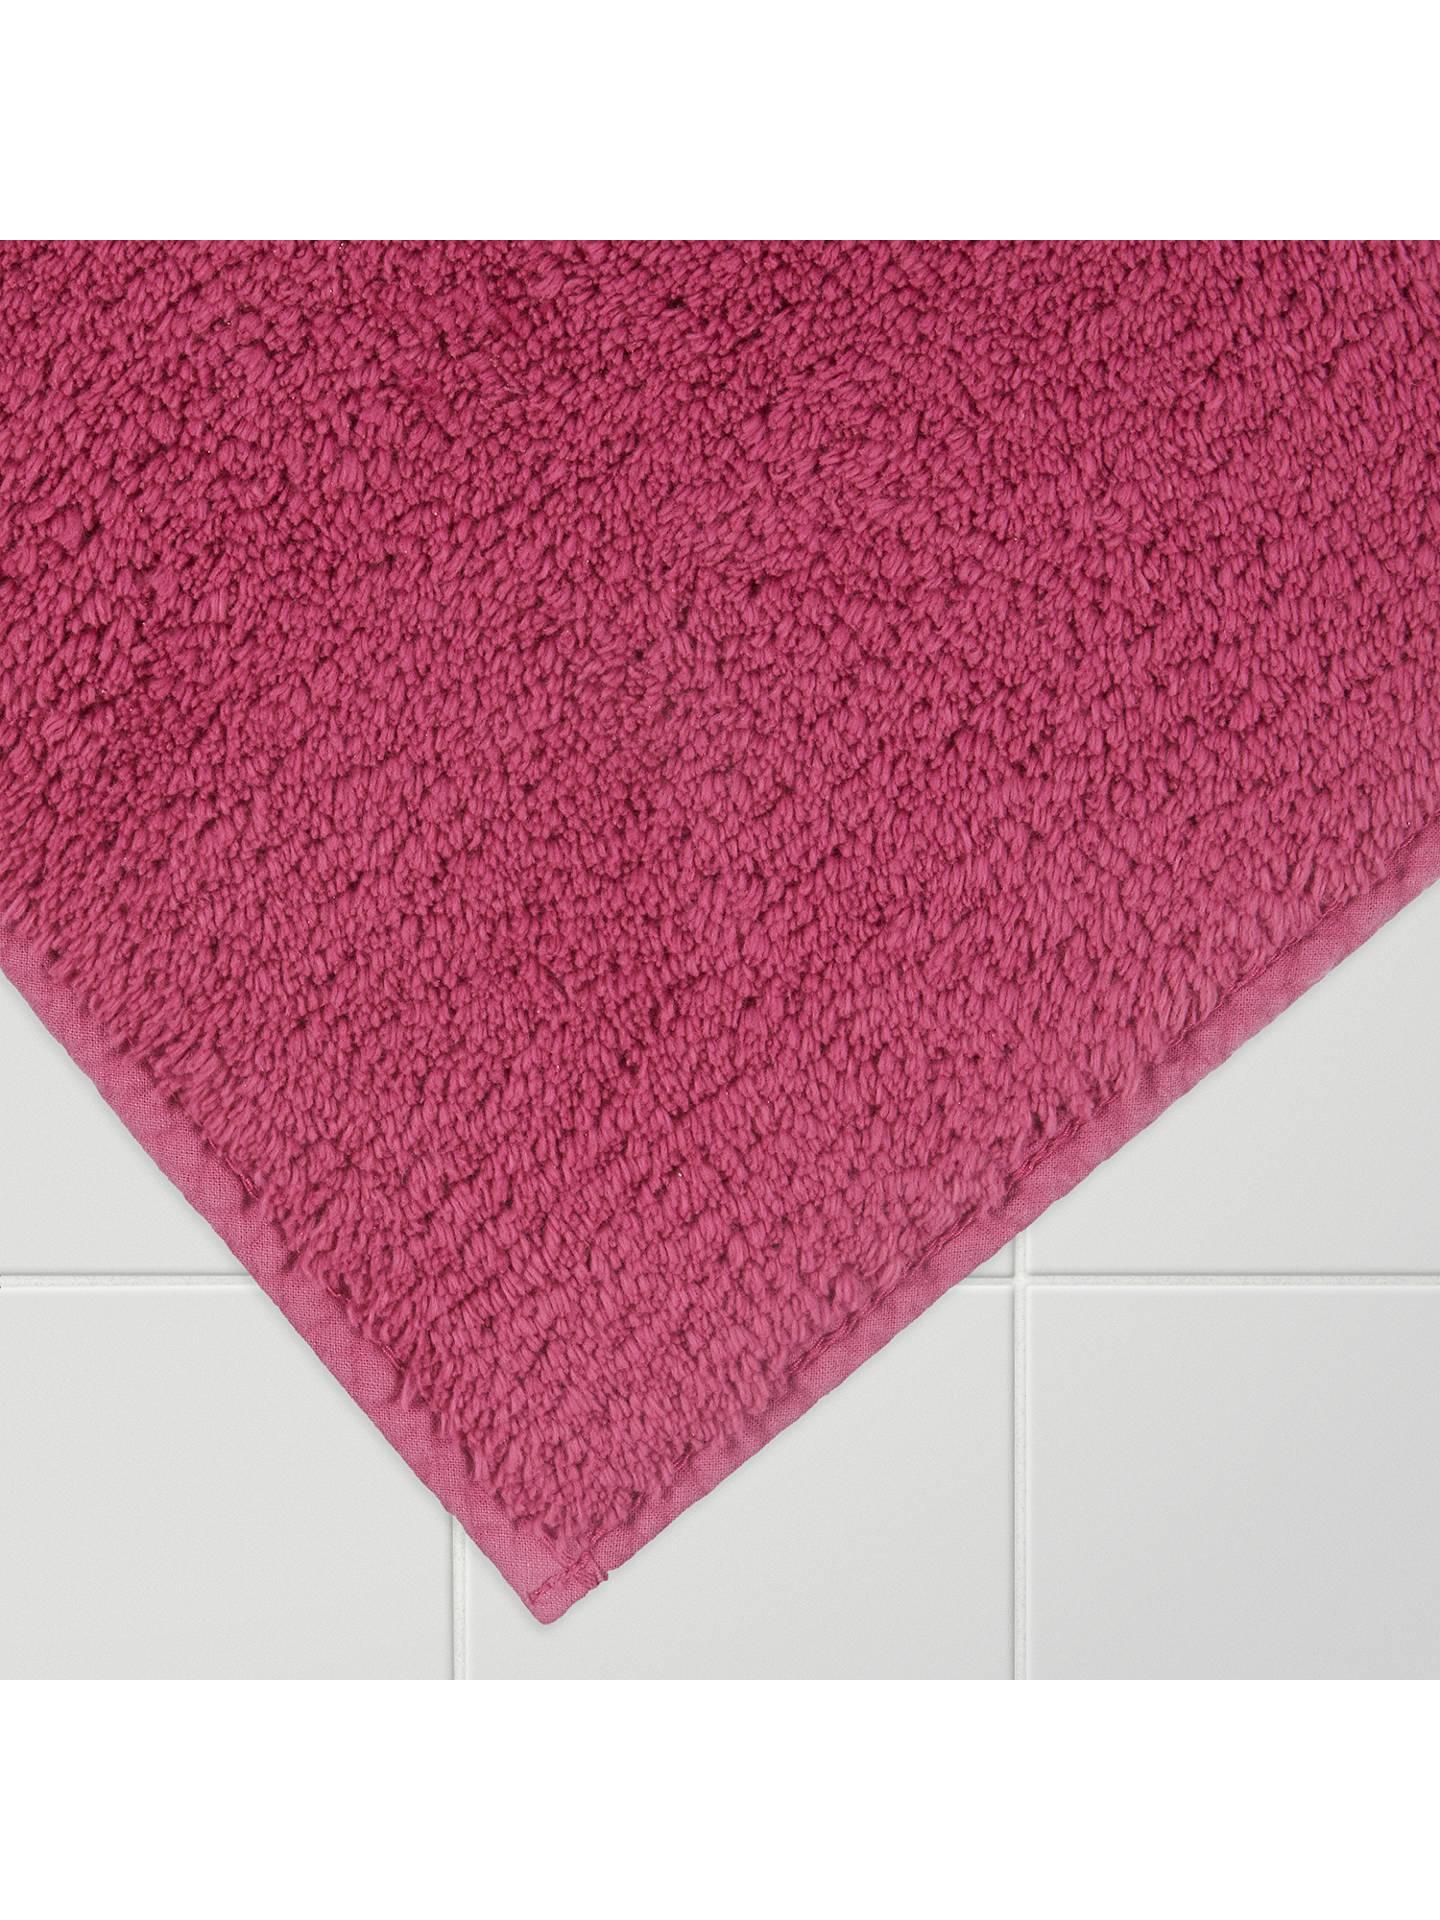 John Lewis Clic Anti Slip Bath Mat Dahlia Online At Johnlewis